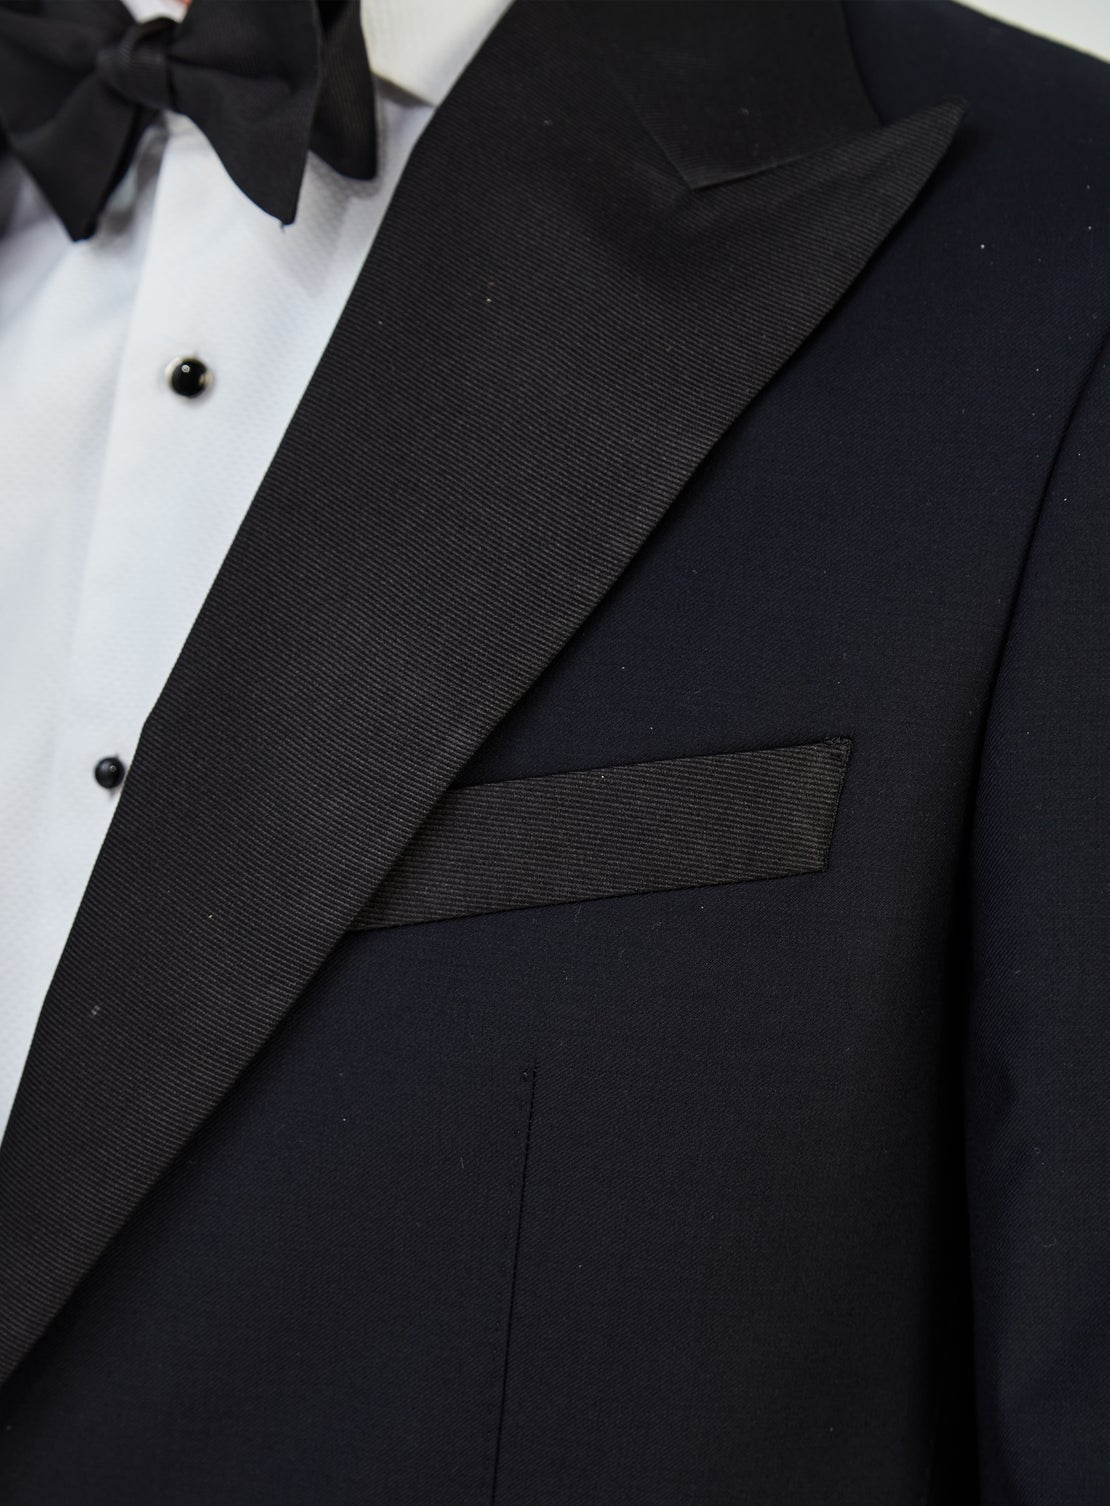 Delon Peak Lapel Dinner Suit